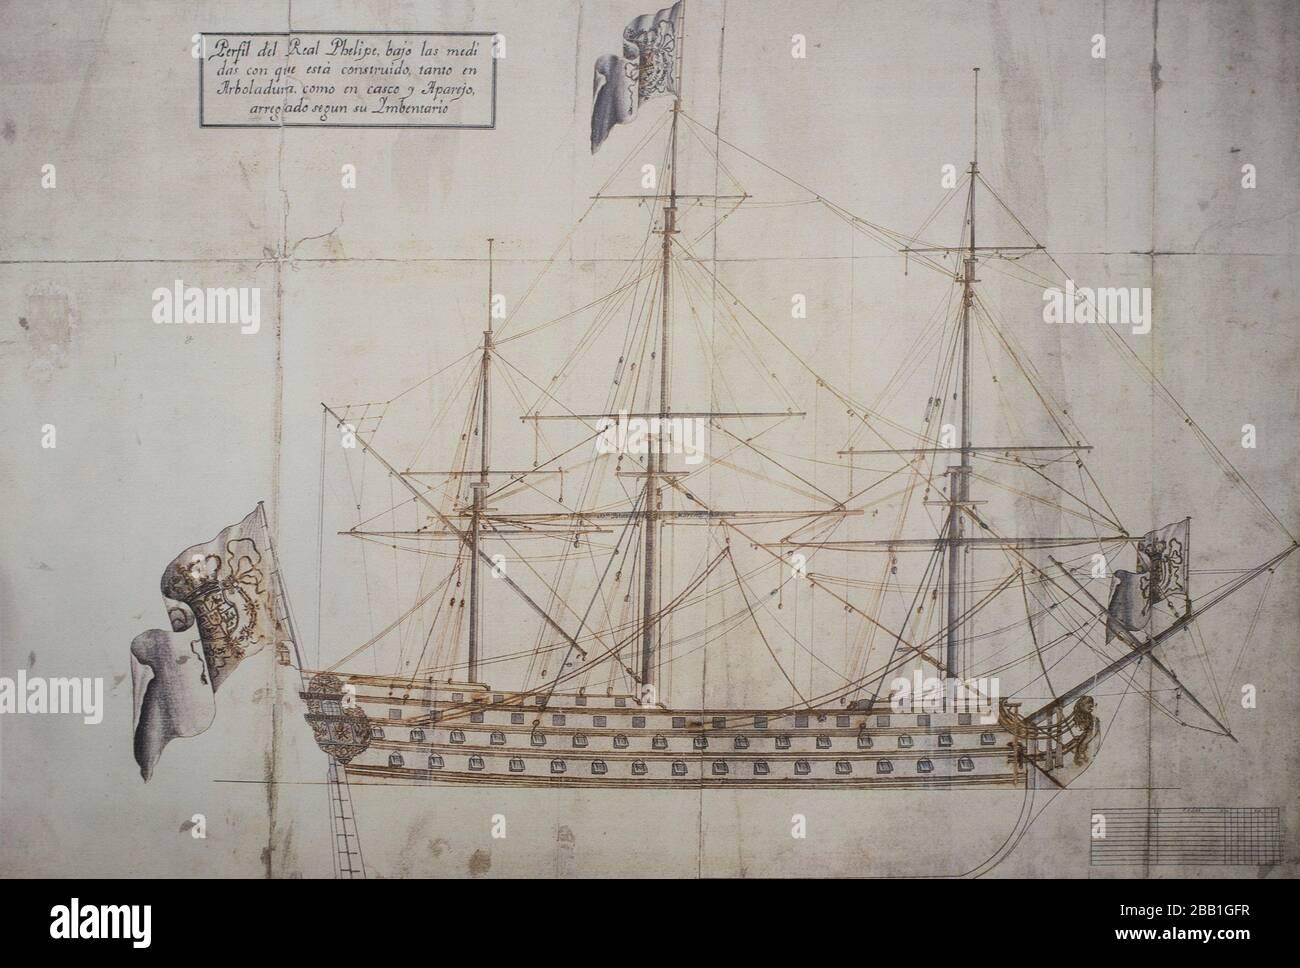 Real San Felipe ship profile. 18th Century spanish naval warship. Stock Photo